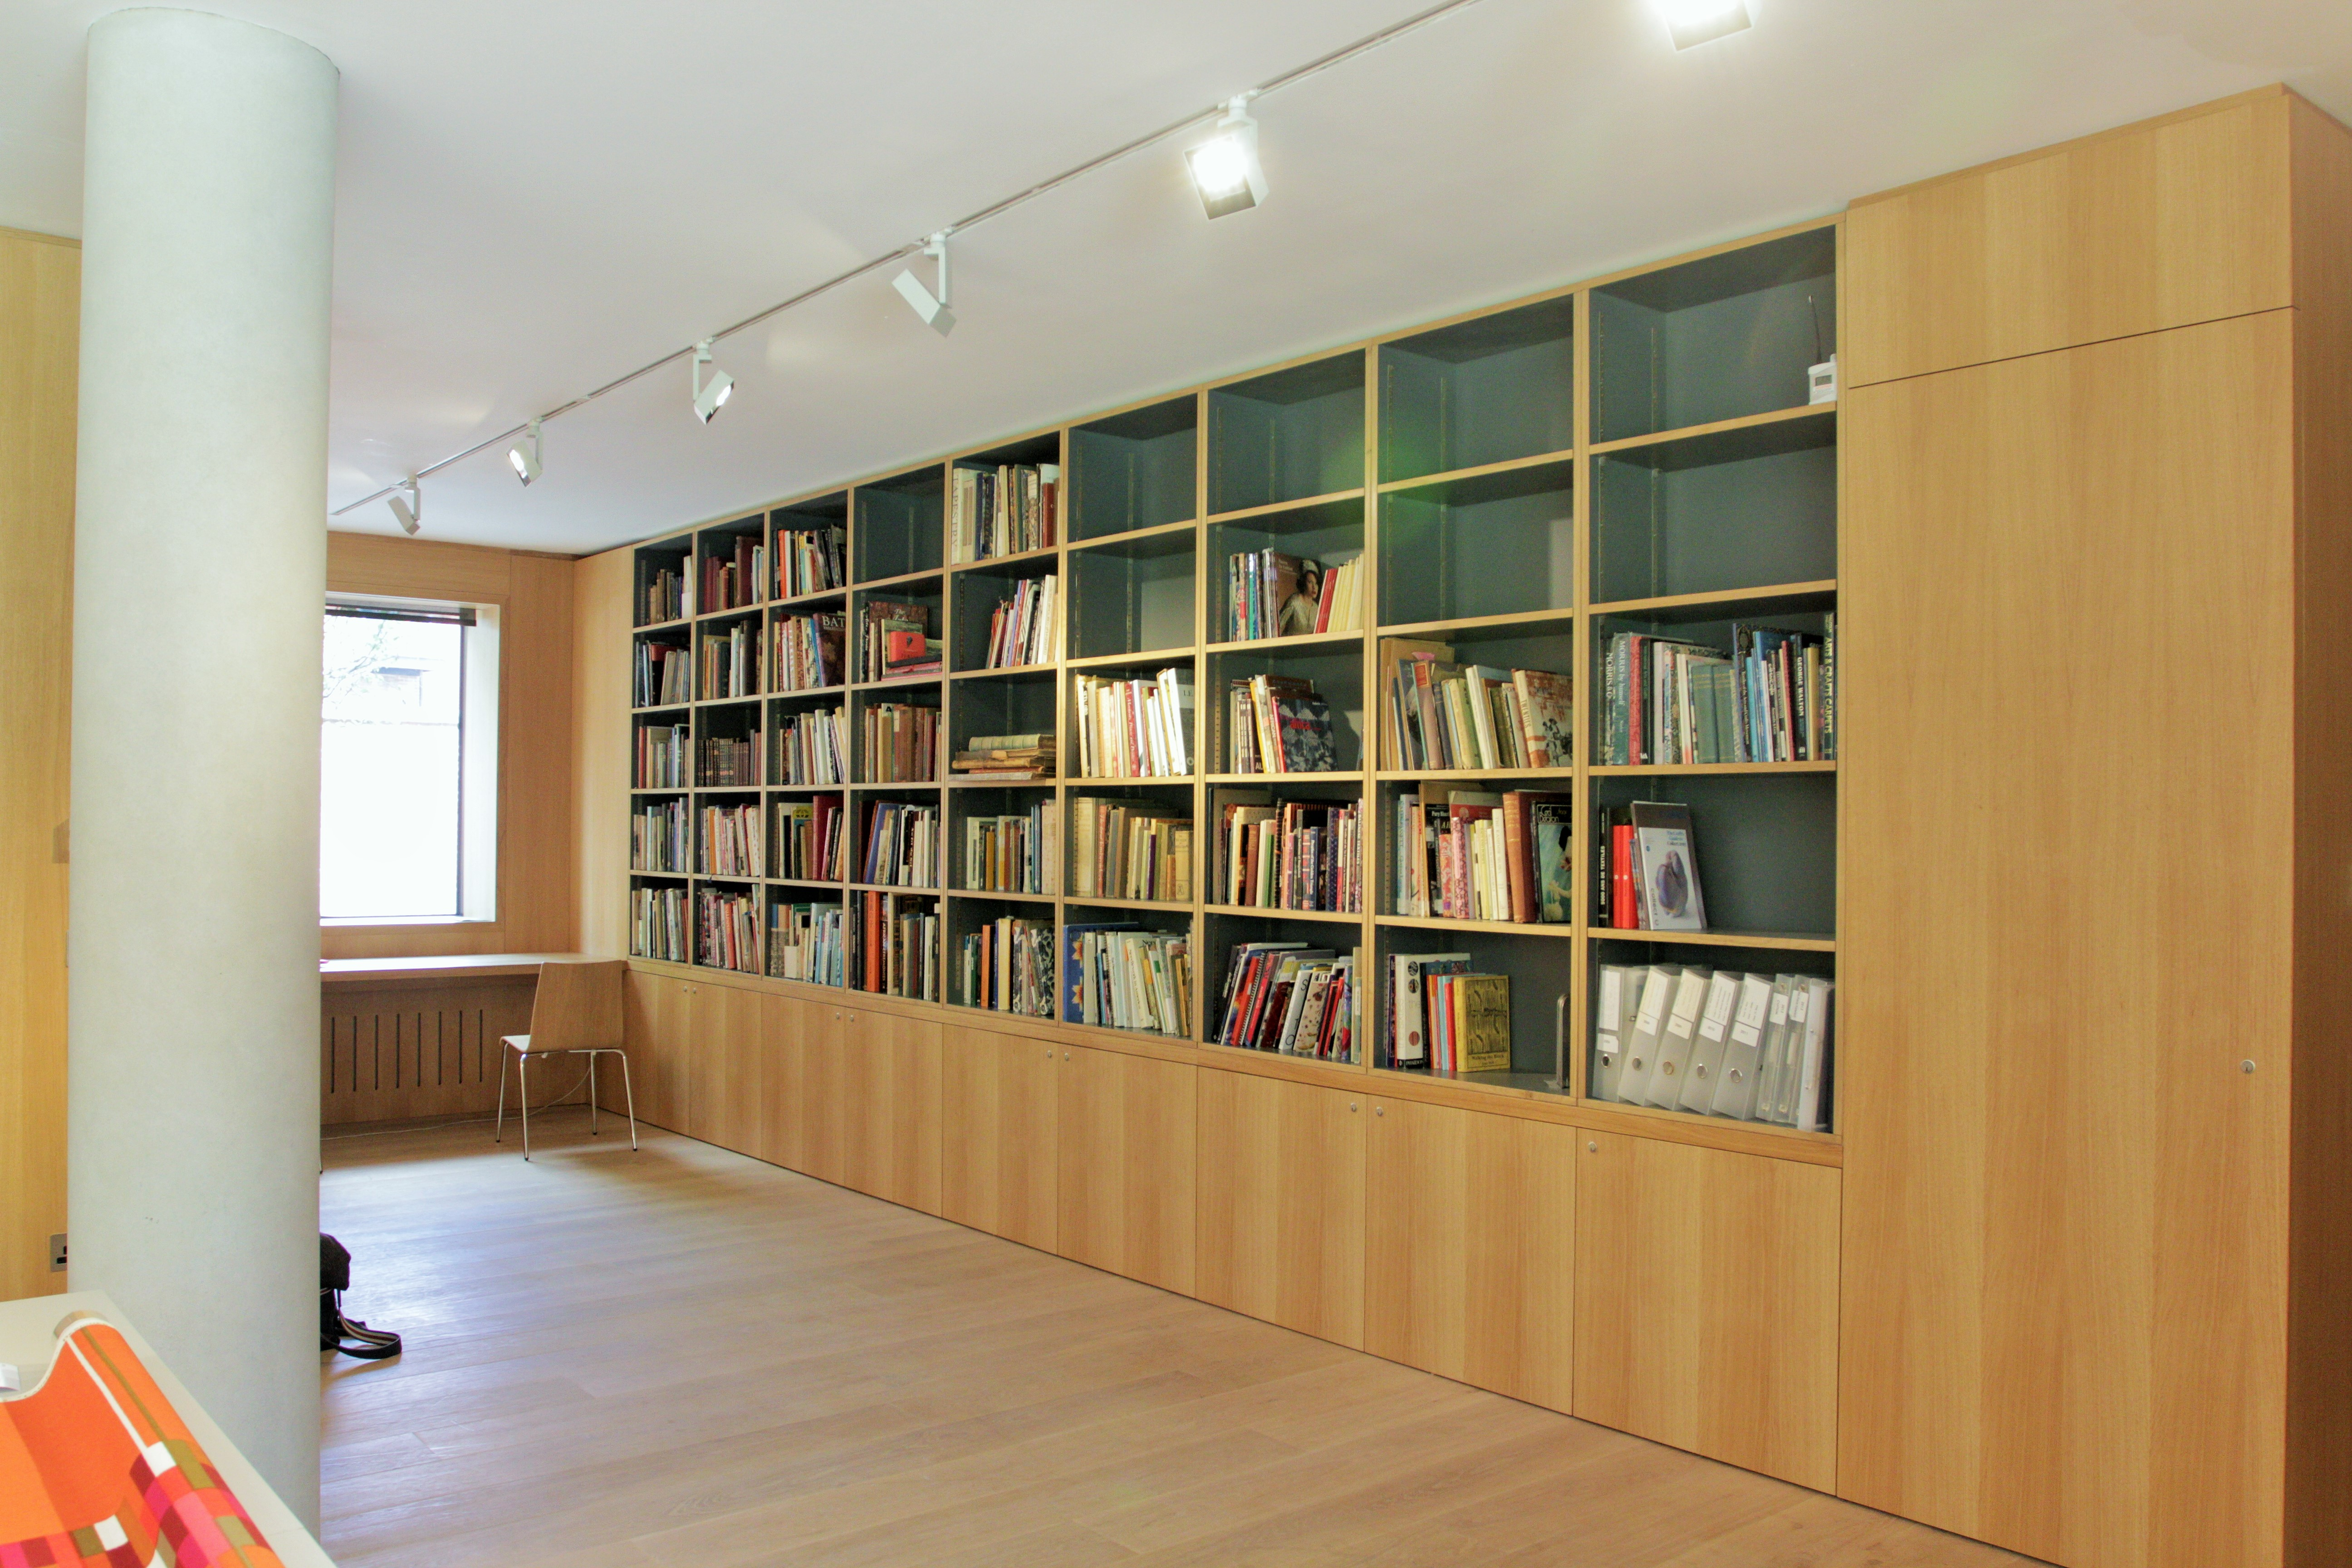 Collection study room ngay